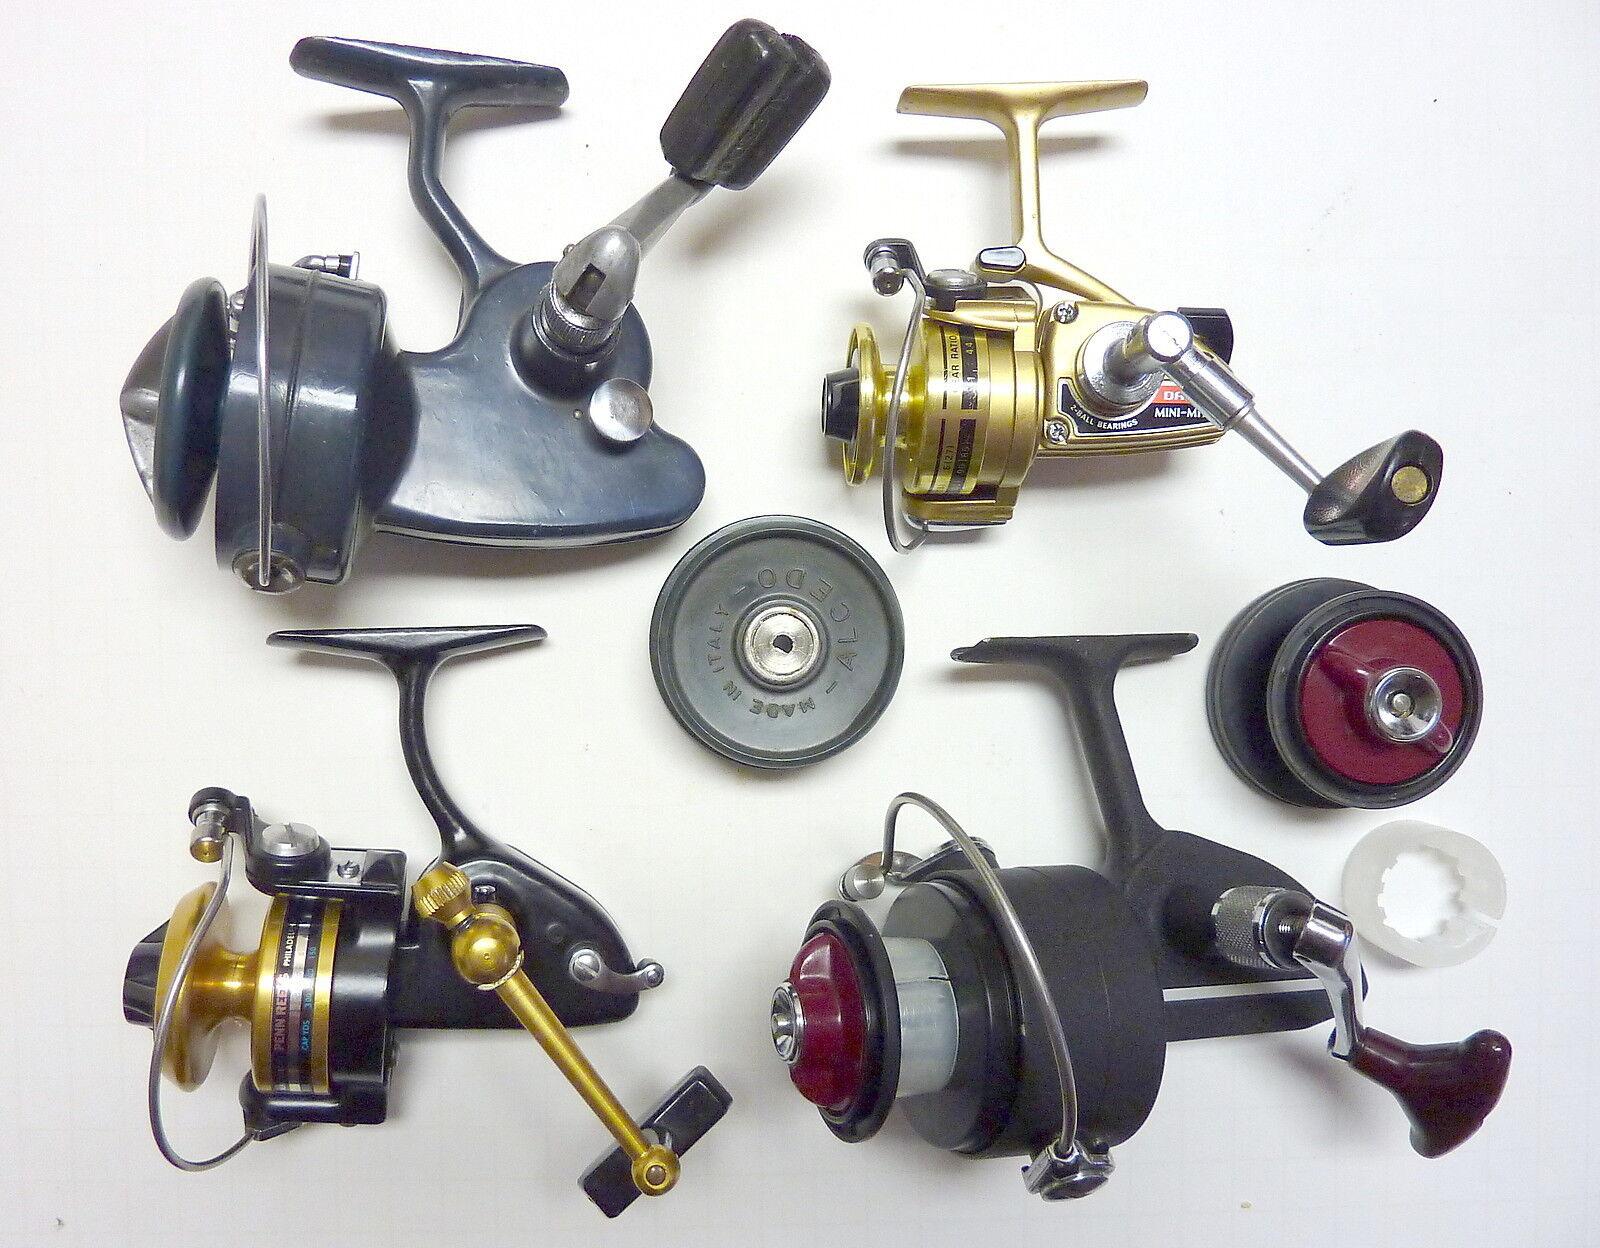 Vintage International Spinning Fishing Reel Collection  Alcedo, Daiwa, Penn,  DAM  gorgeous